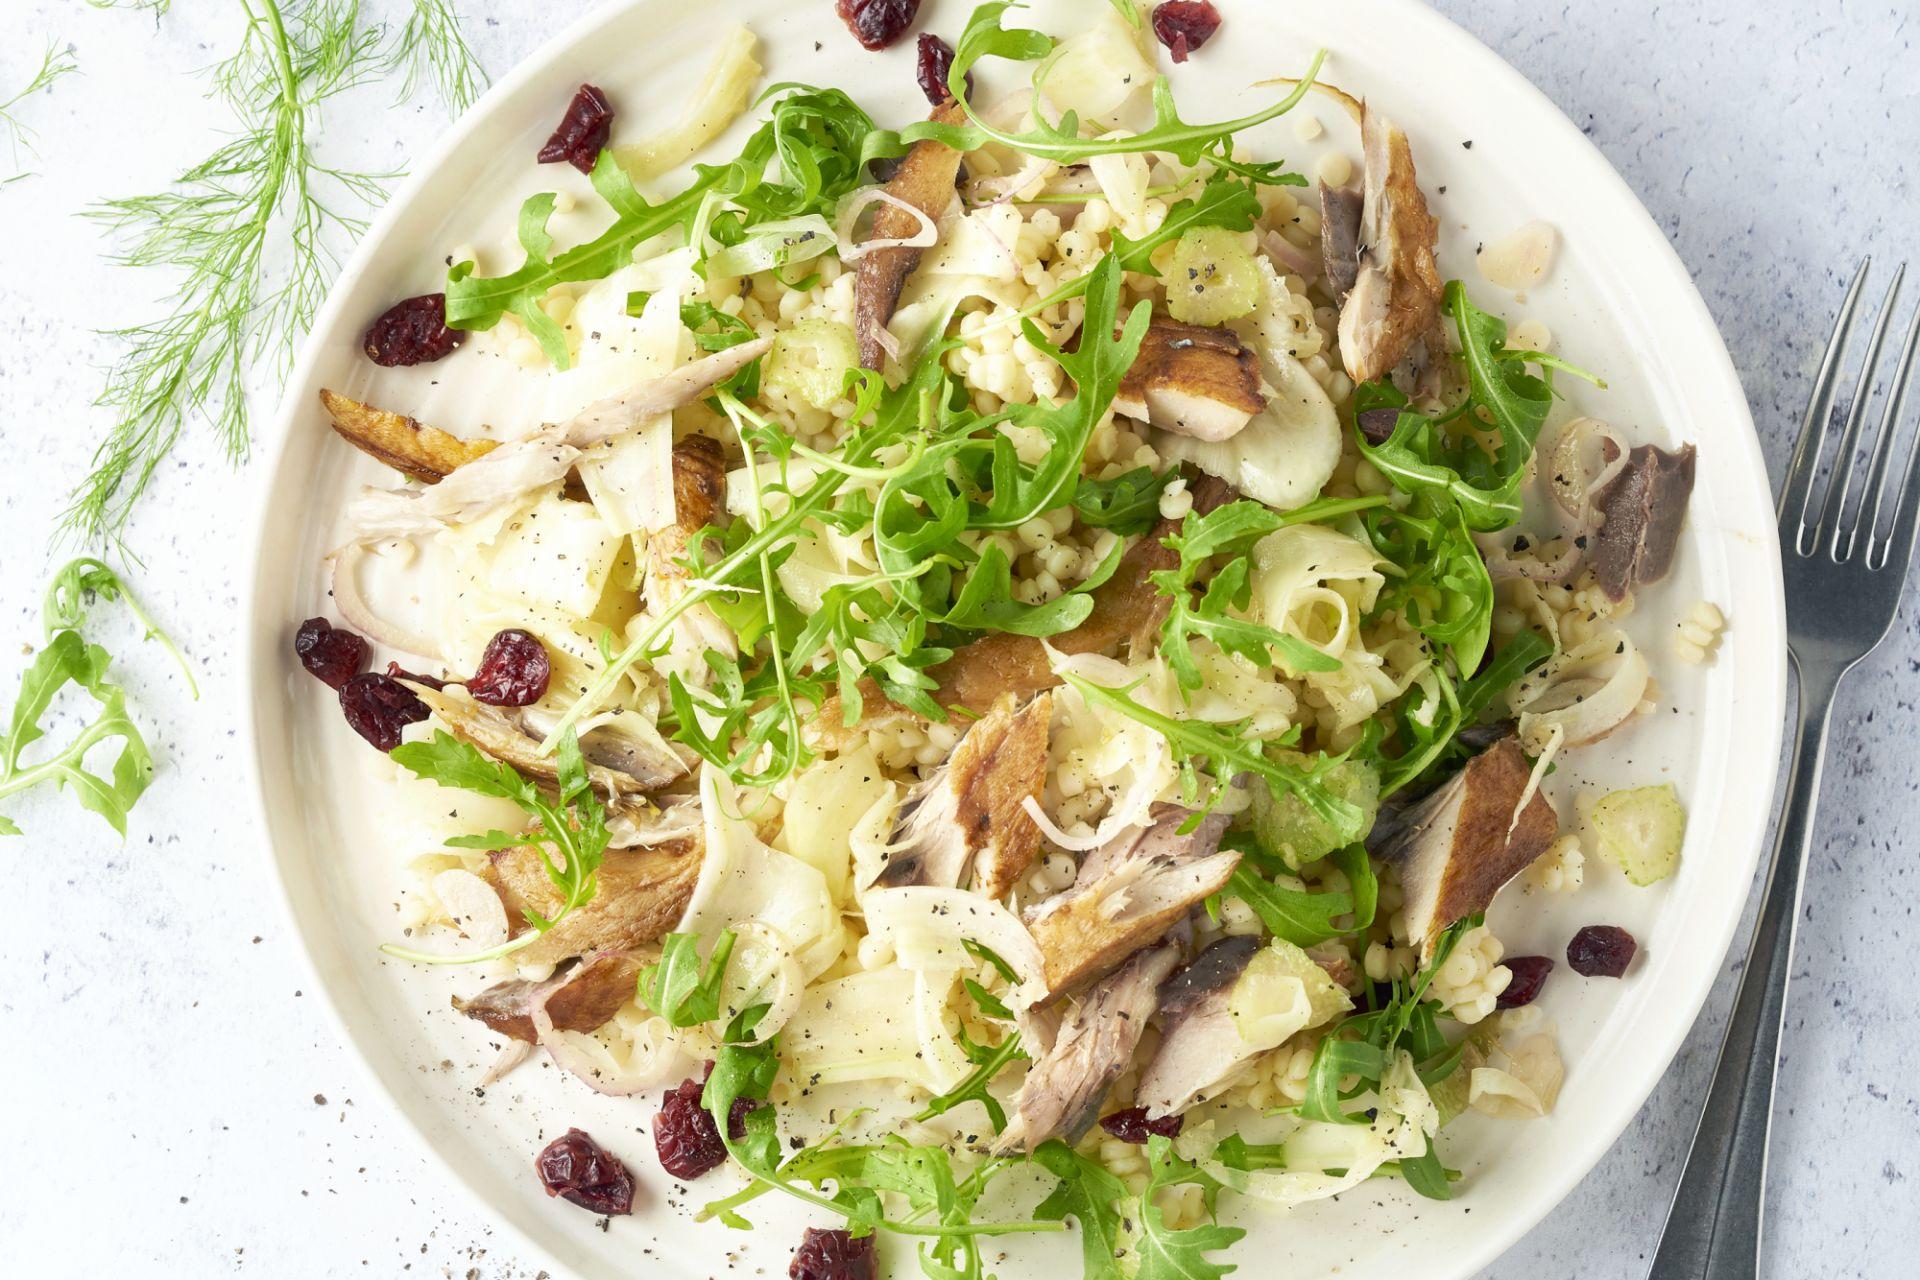 Salade van fregola sarda, gerookte makreel en gemarineerde venkel